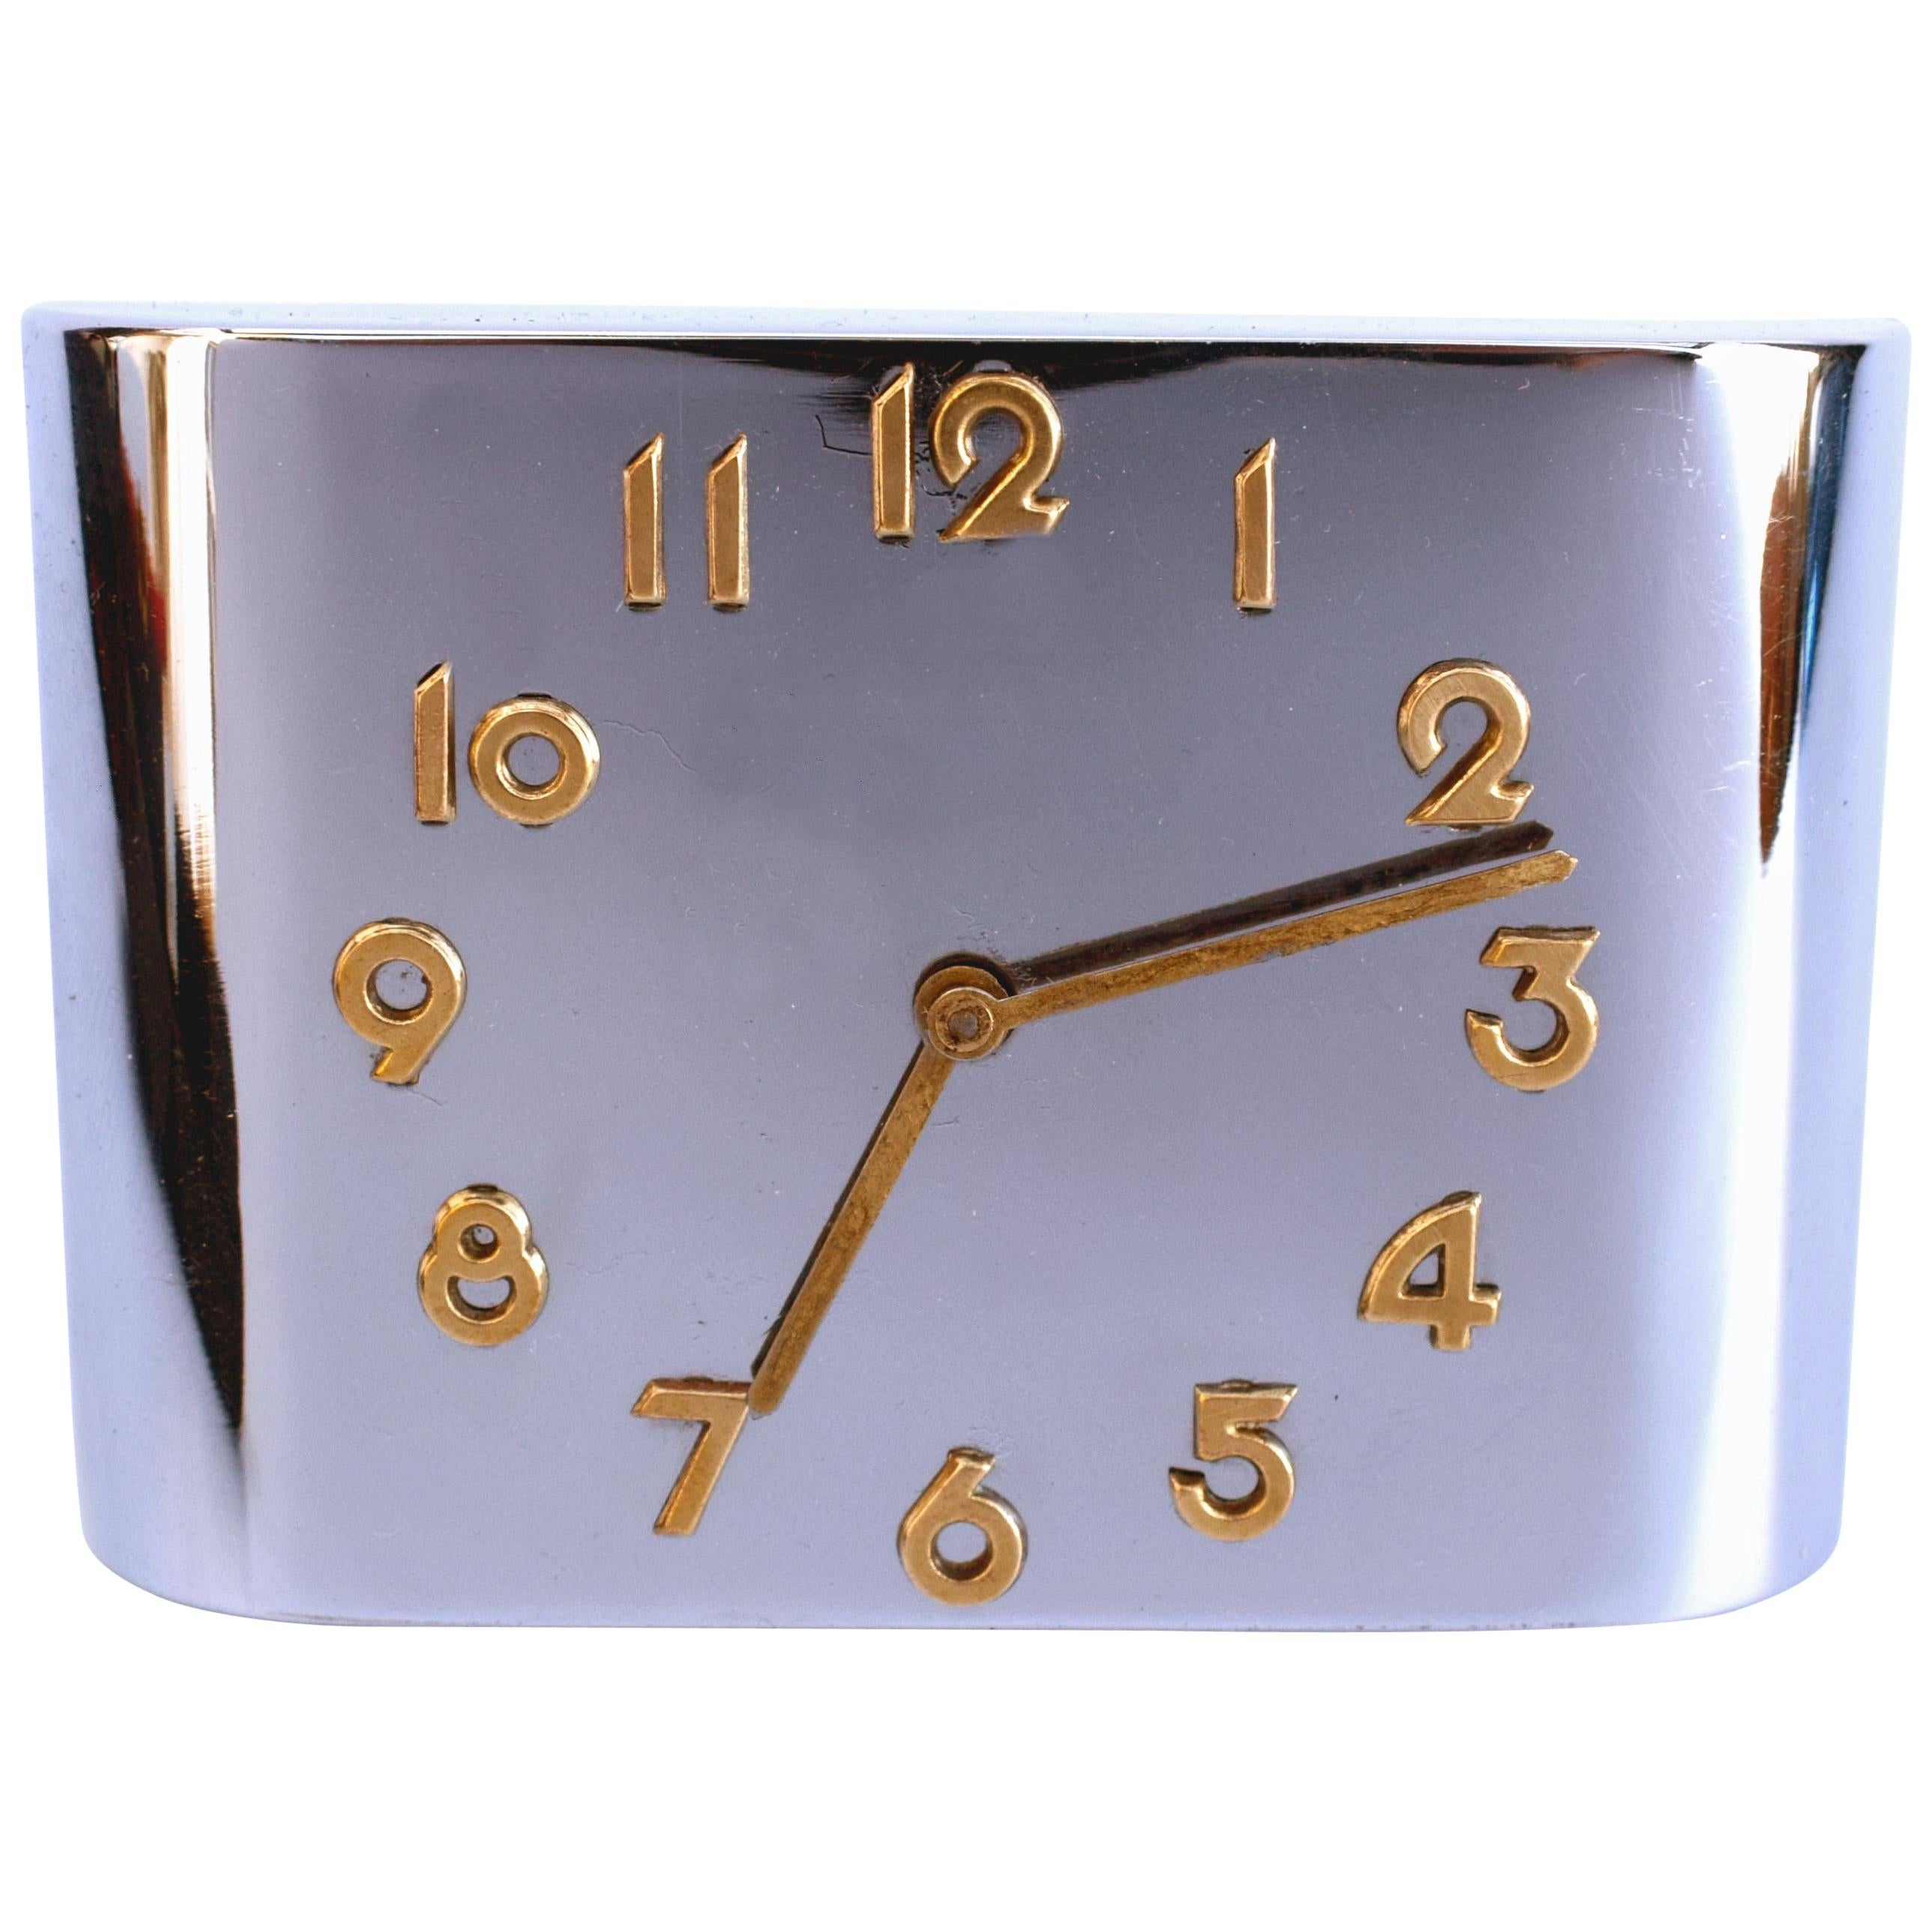 Art Deco Modernist Chrome Travel Alarm Clock, c1930